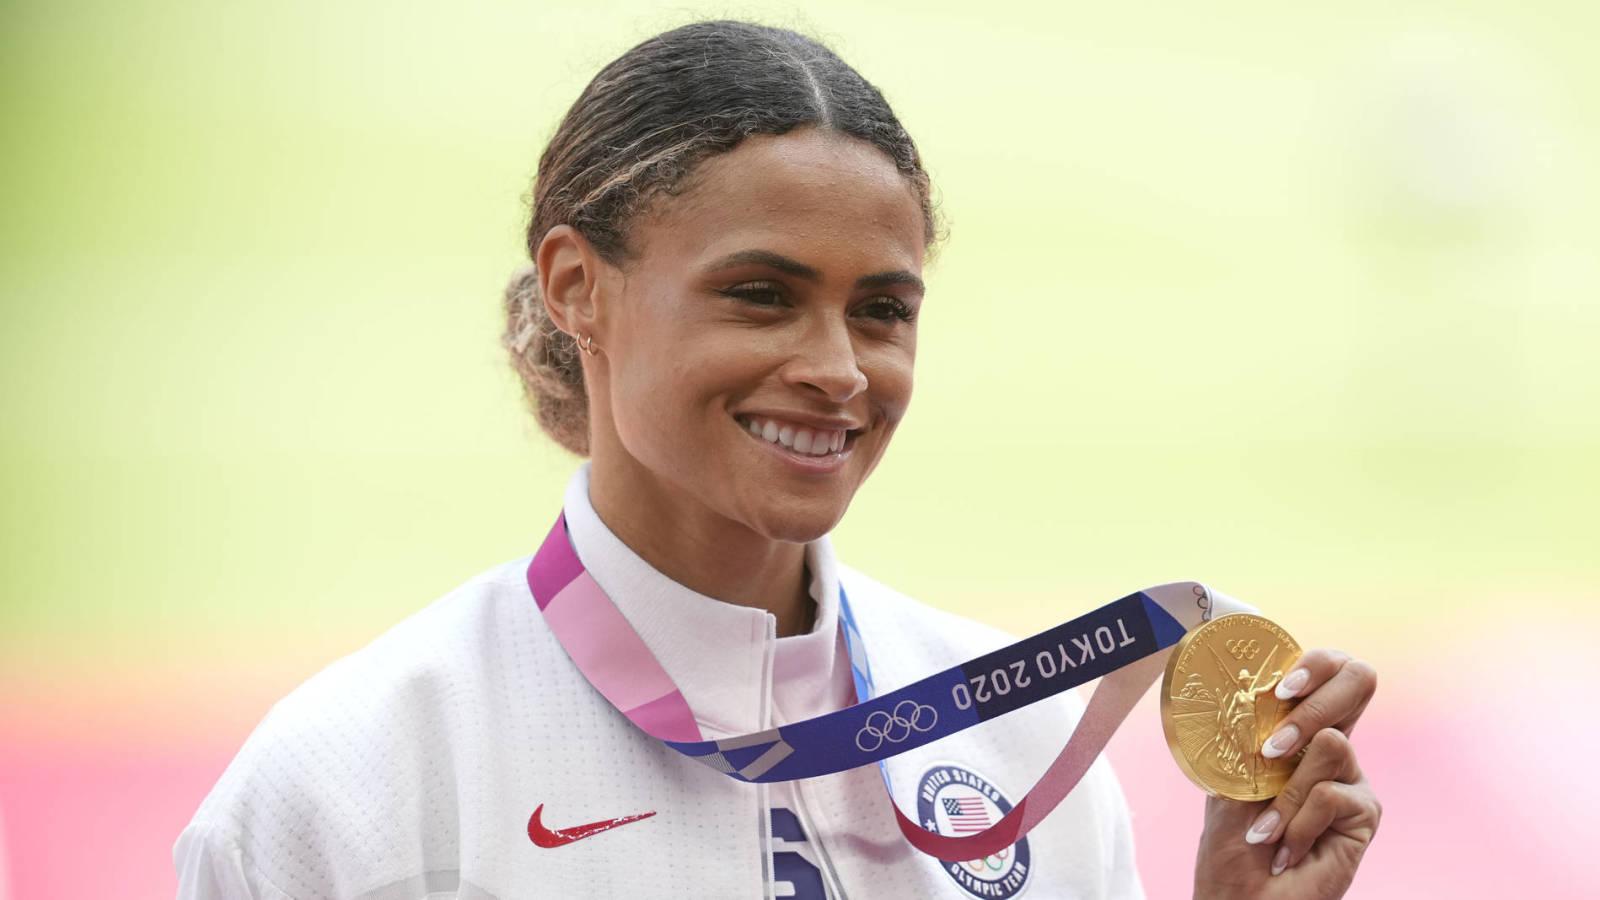 American track star Sydney McLaughlin breaks own world record at Tokyo Games - Yardbarker